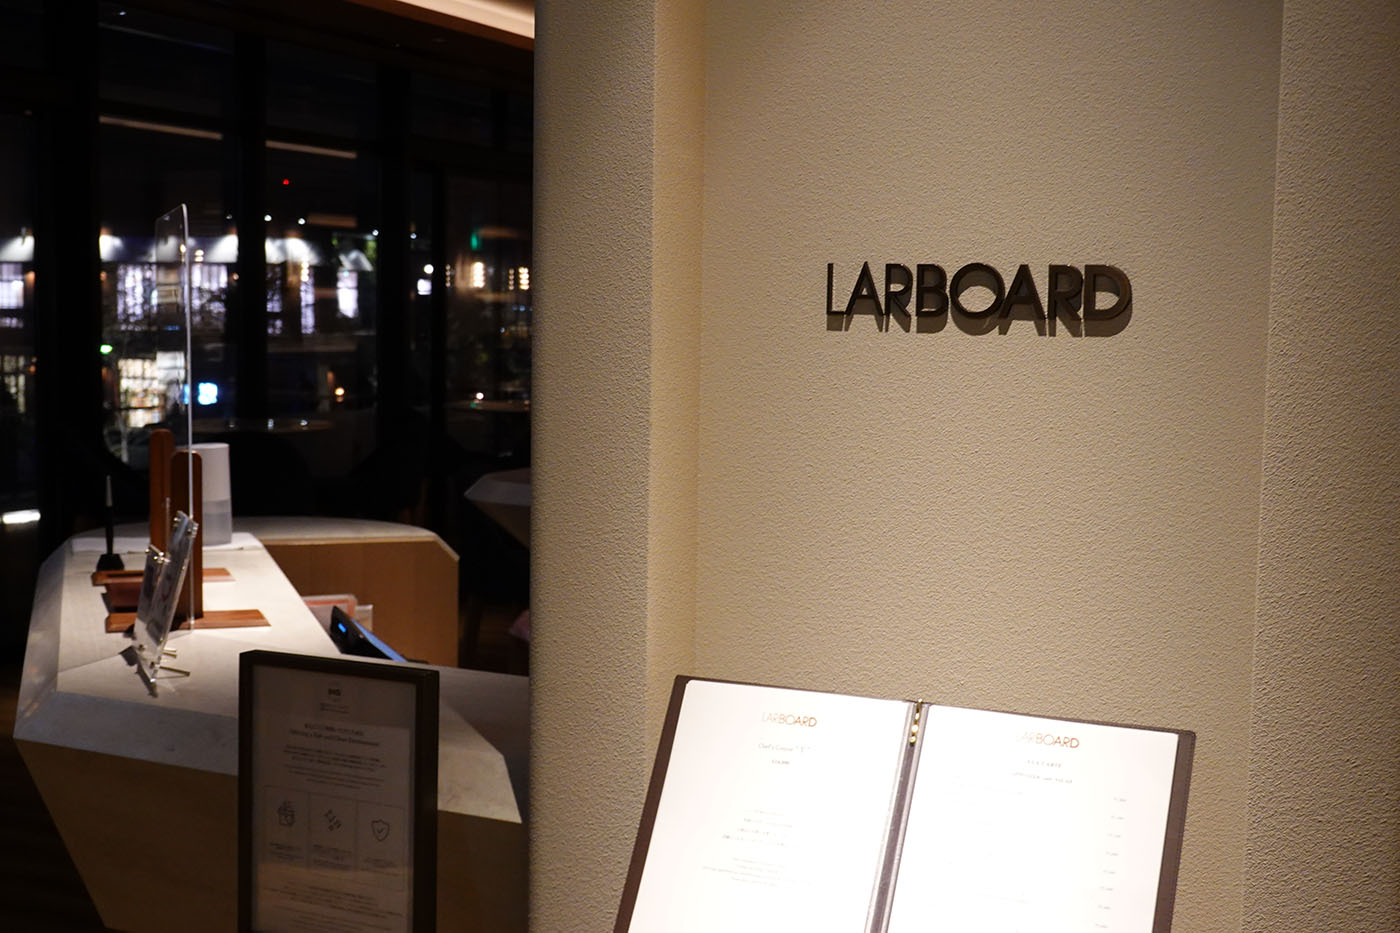 Larboardエントランス